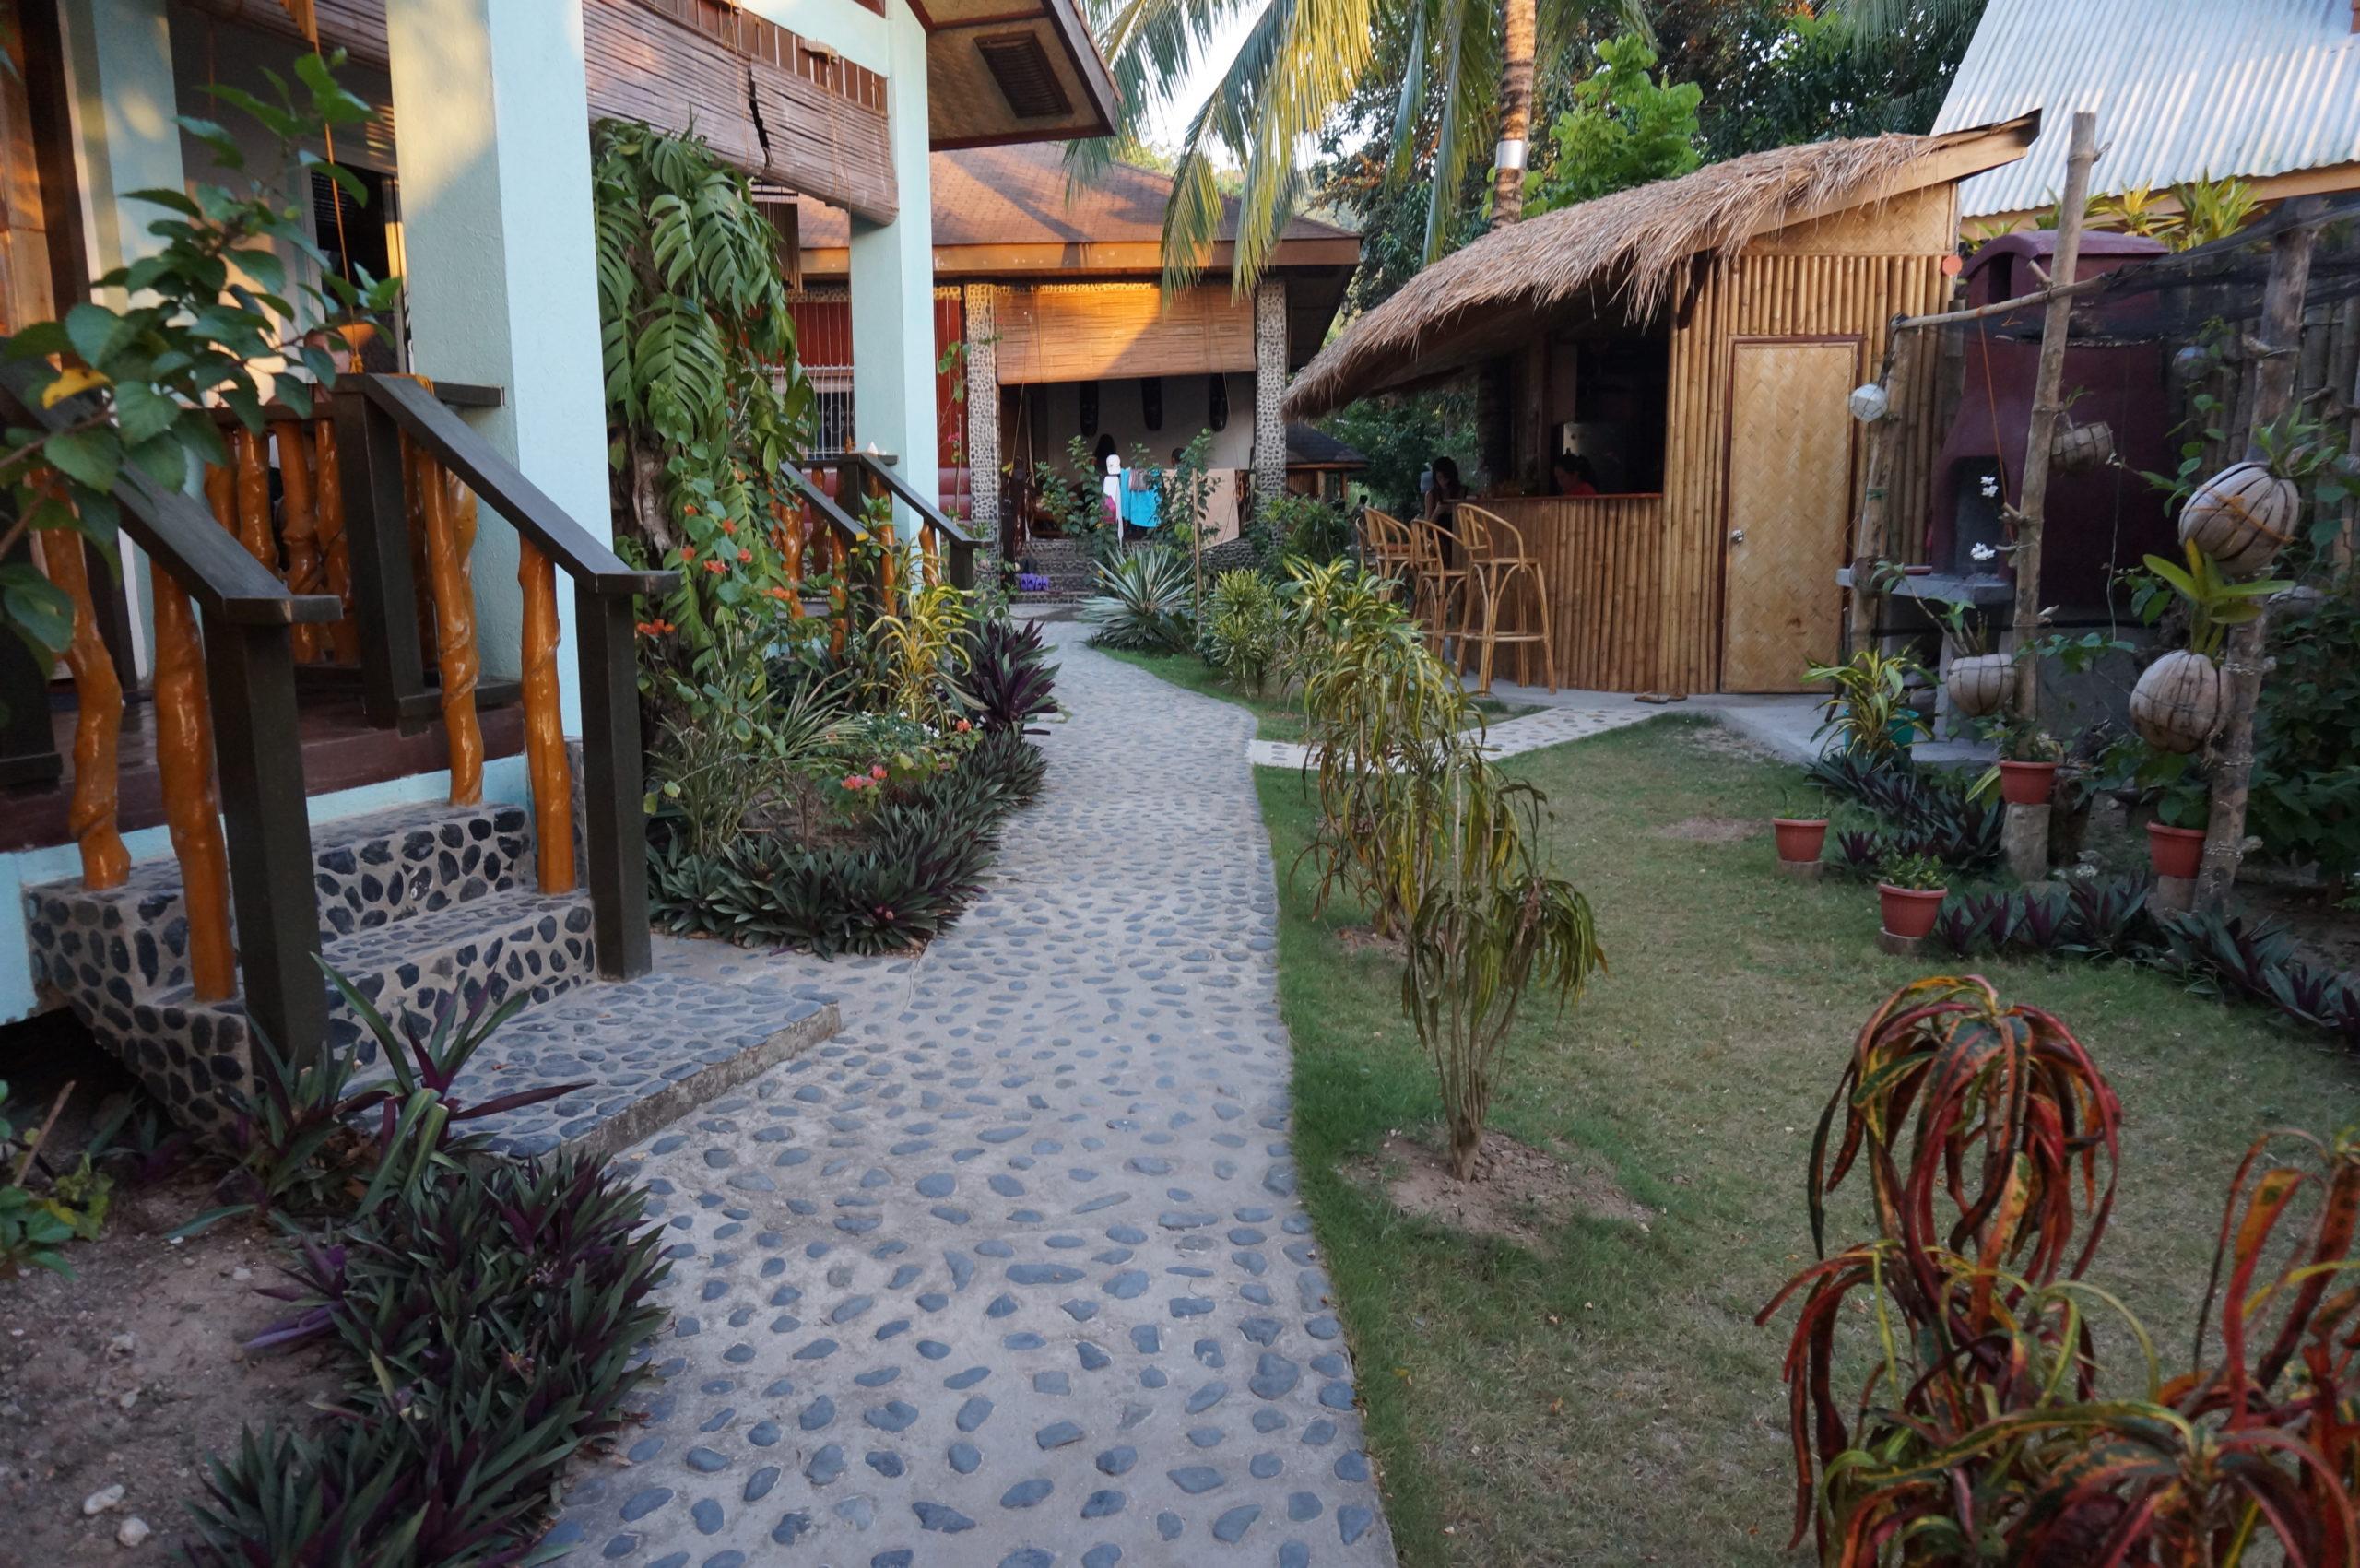 AngelNido hotel - Palawan - Philippines